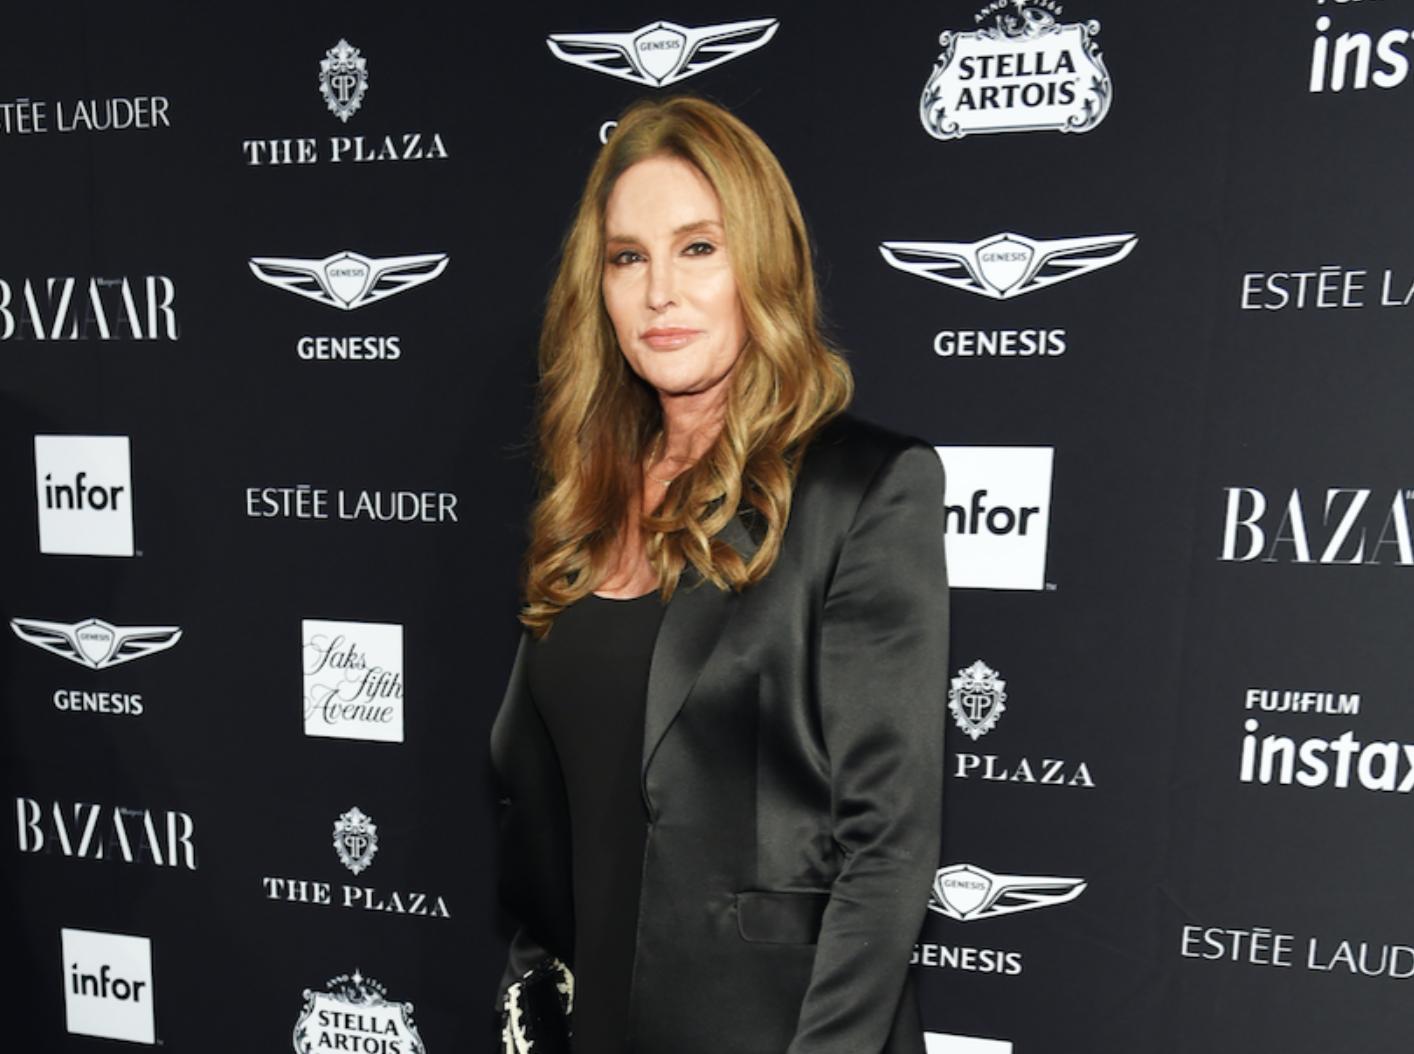 Caitlyn Jenner Slams Trump on Proposal to End Transgender Recognition